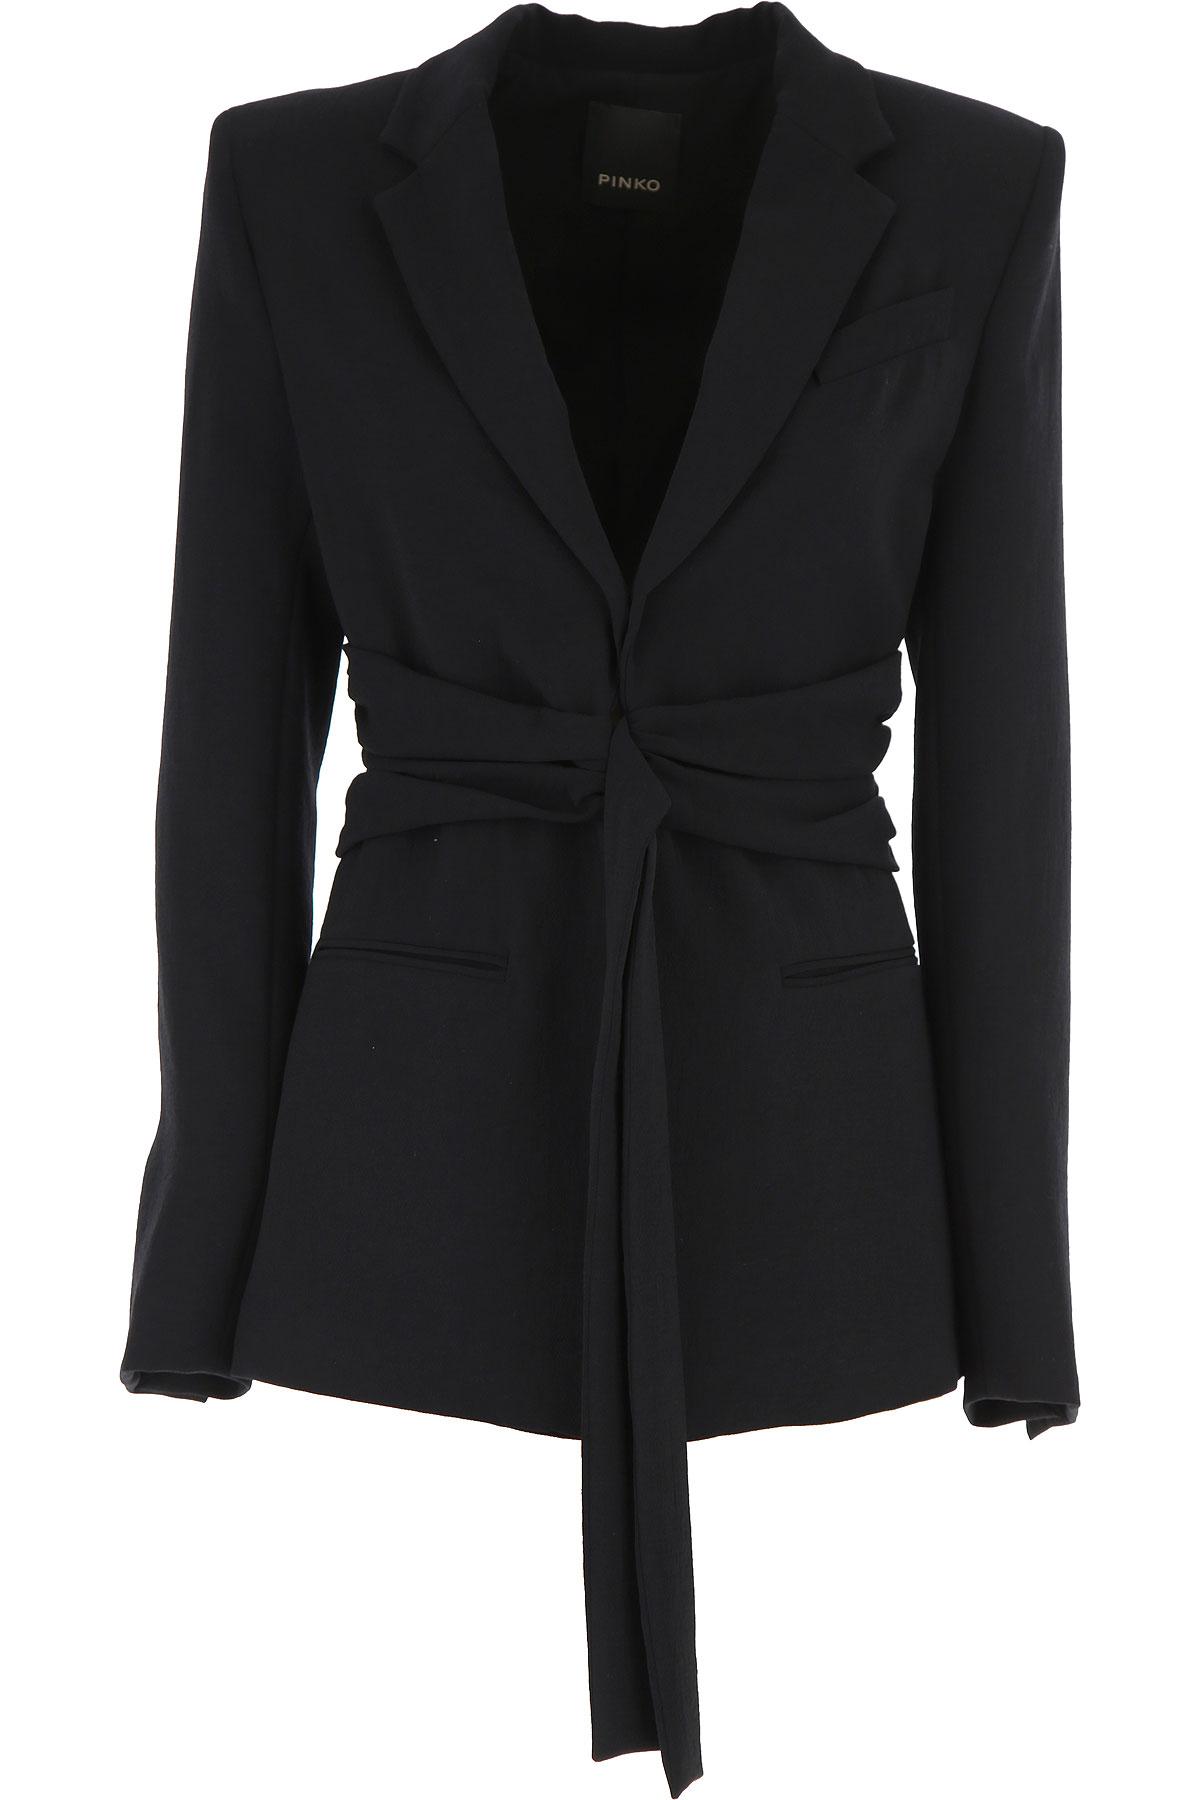 Pinko Blazer for Women On Sale, Black, polyestere, 2019, 10 8